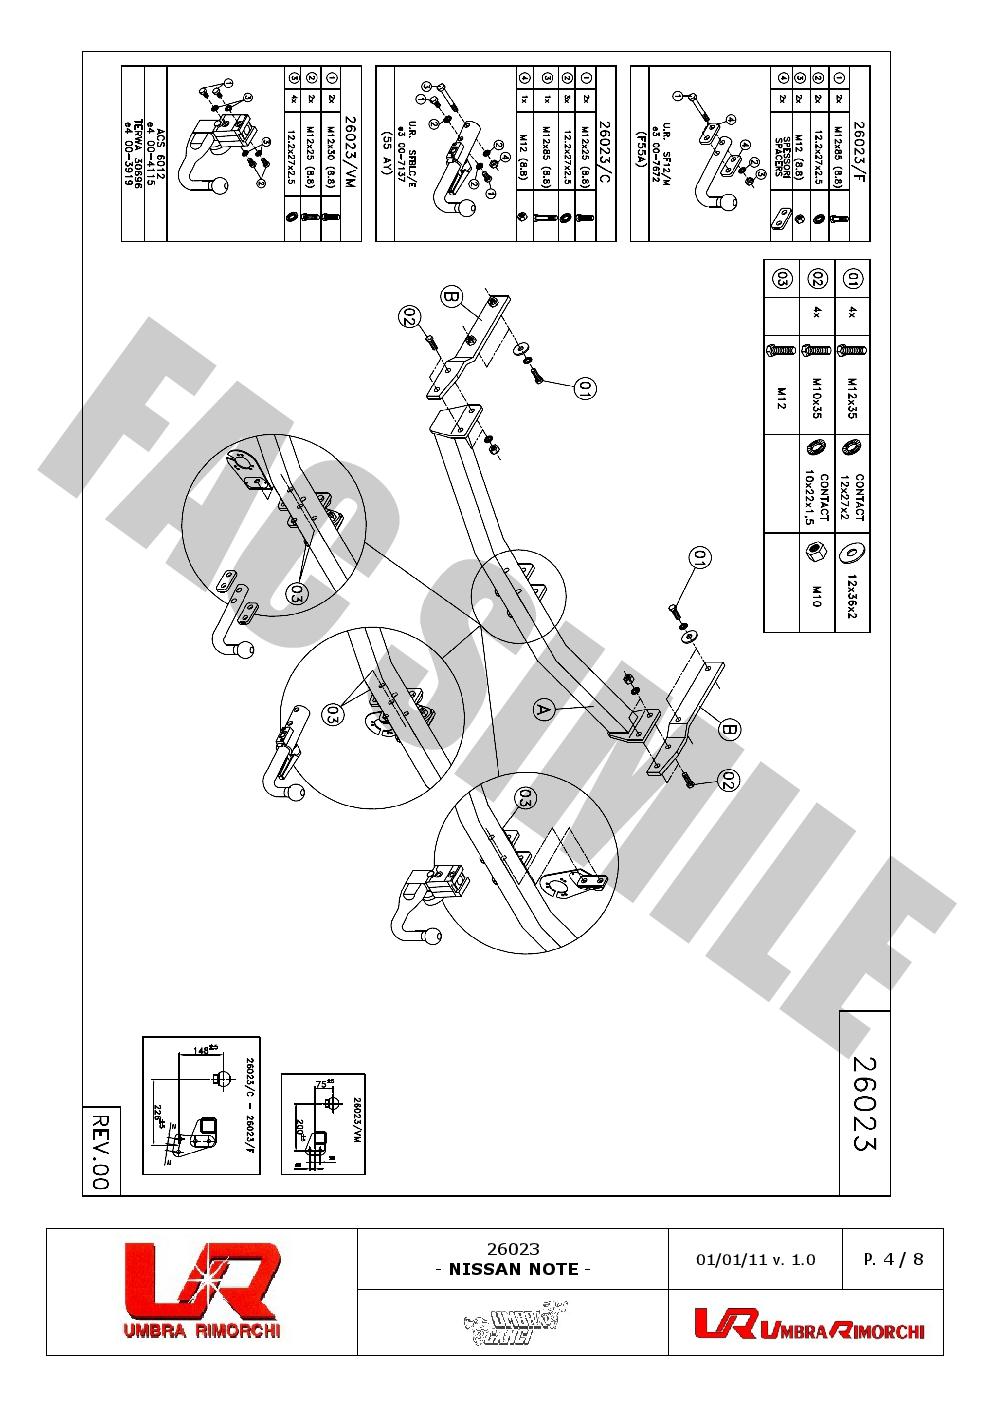 Swan-Neck-Towbar-13p-C2-Wiring-Kit-for-